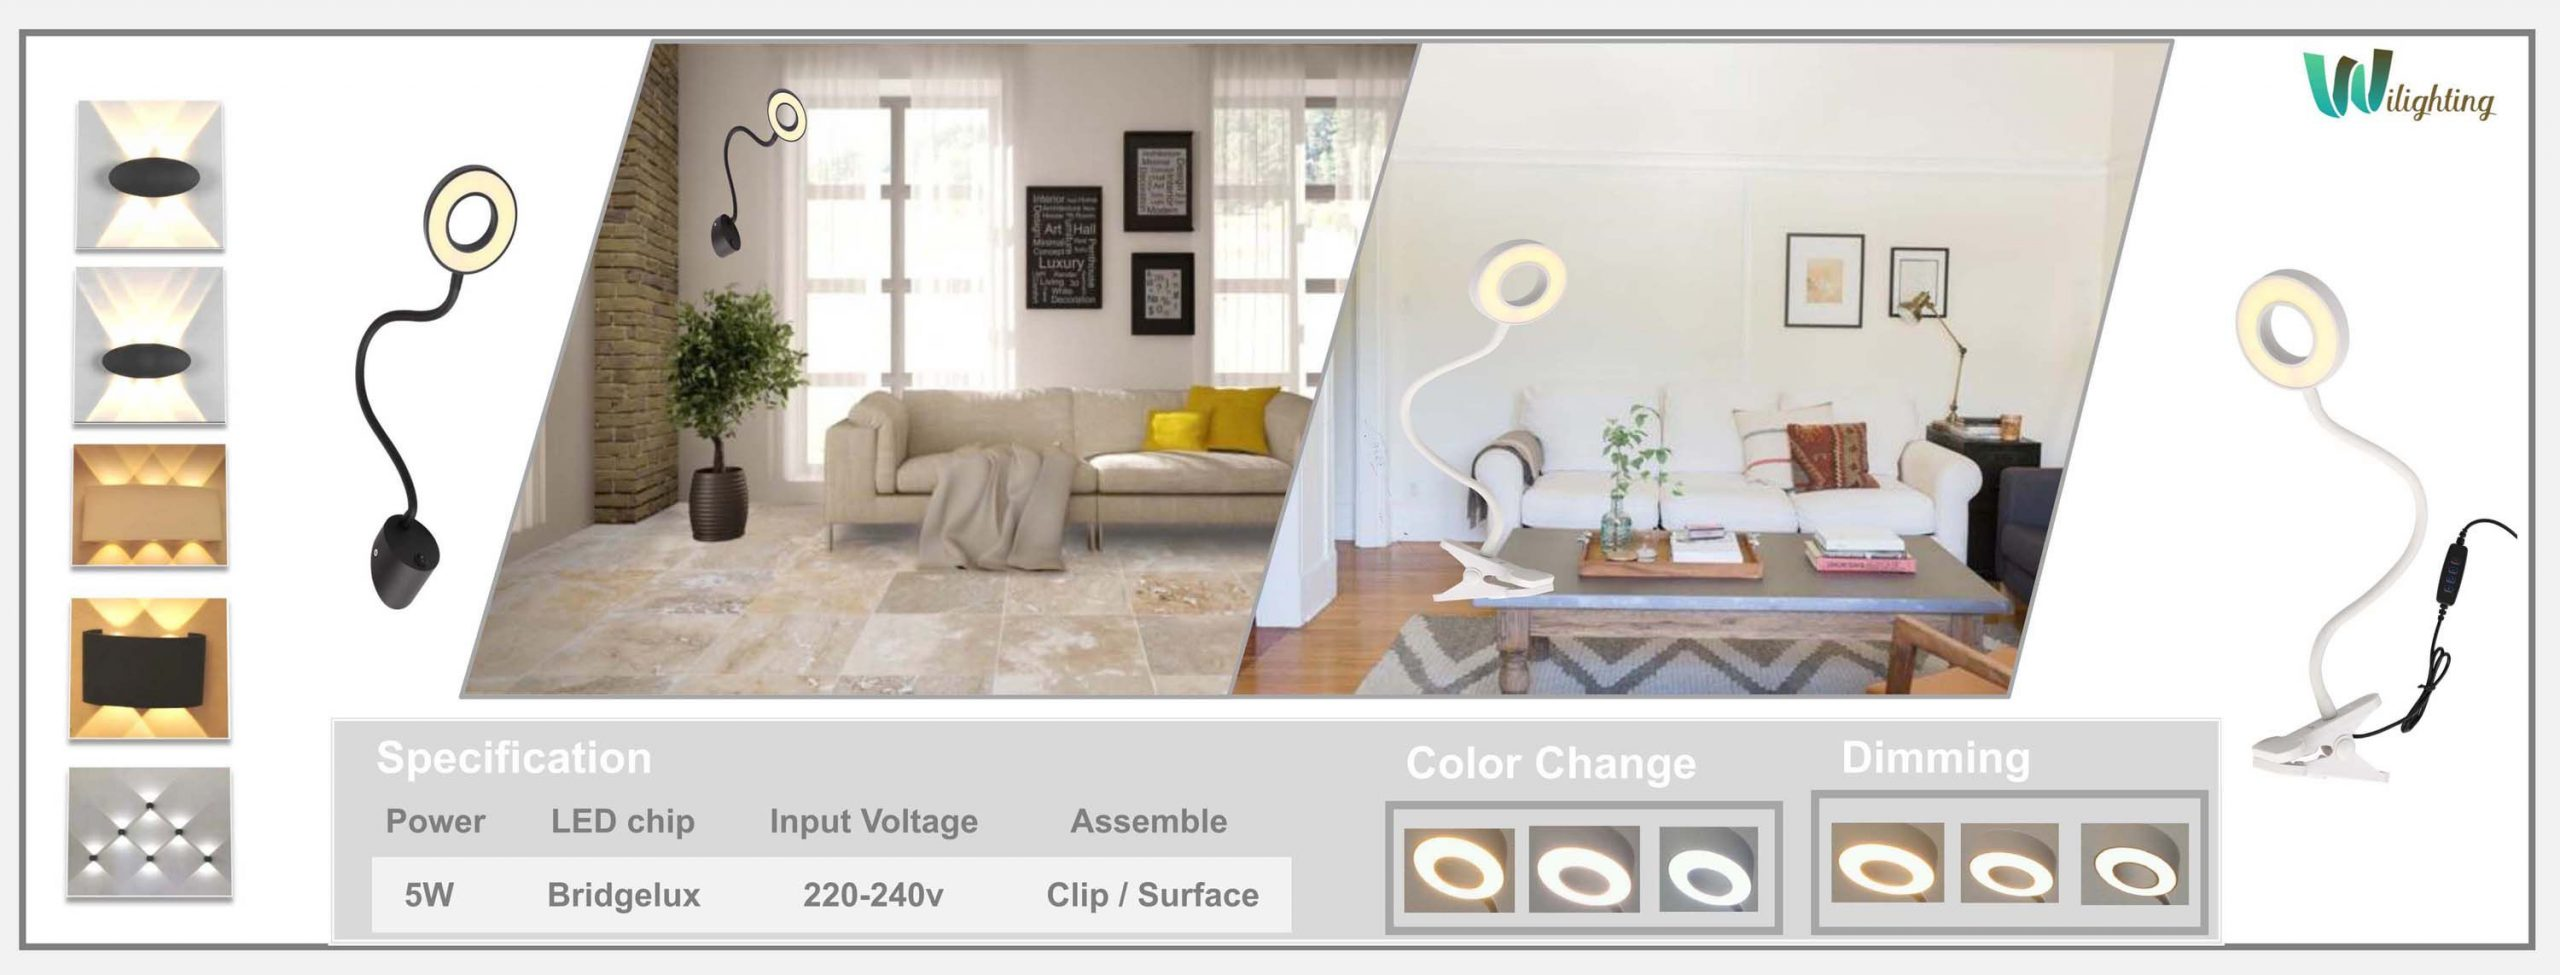 LED Wall Sconces-FlexibleWall Light Fixture Indoor